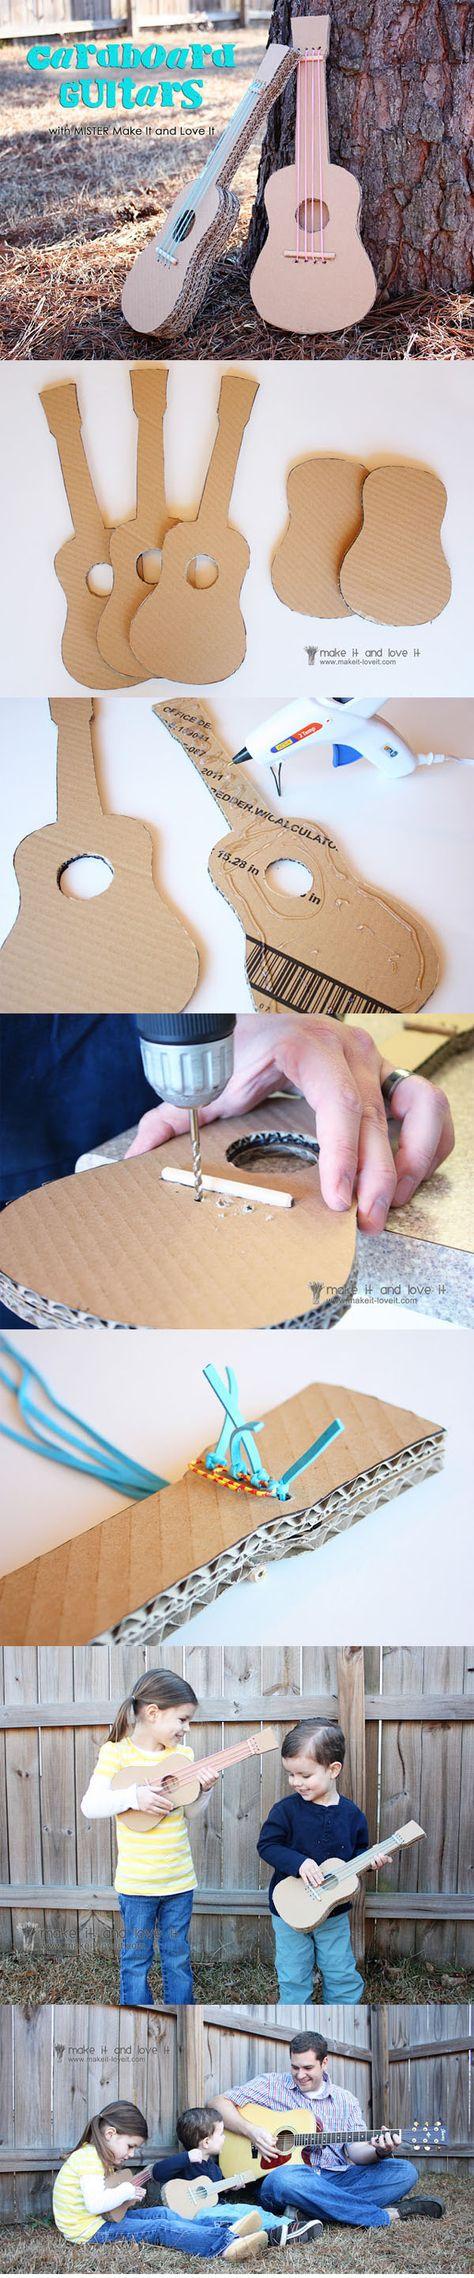 DIY  ::  Cardboard Guitars ( http://www.makeit-loveit.com/2011/03/mister-make-it-and-love-it-series.html )